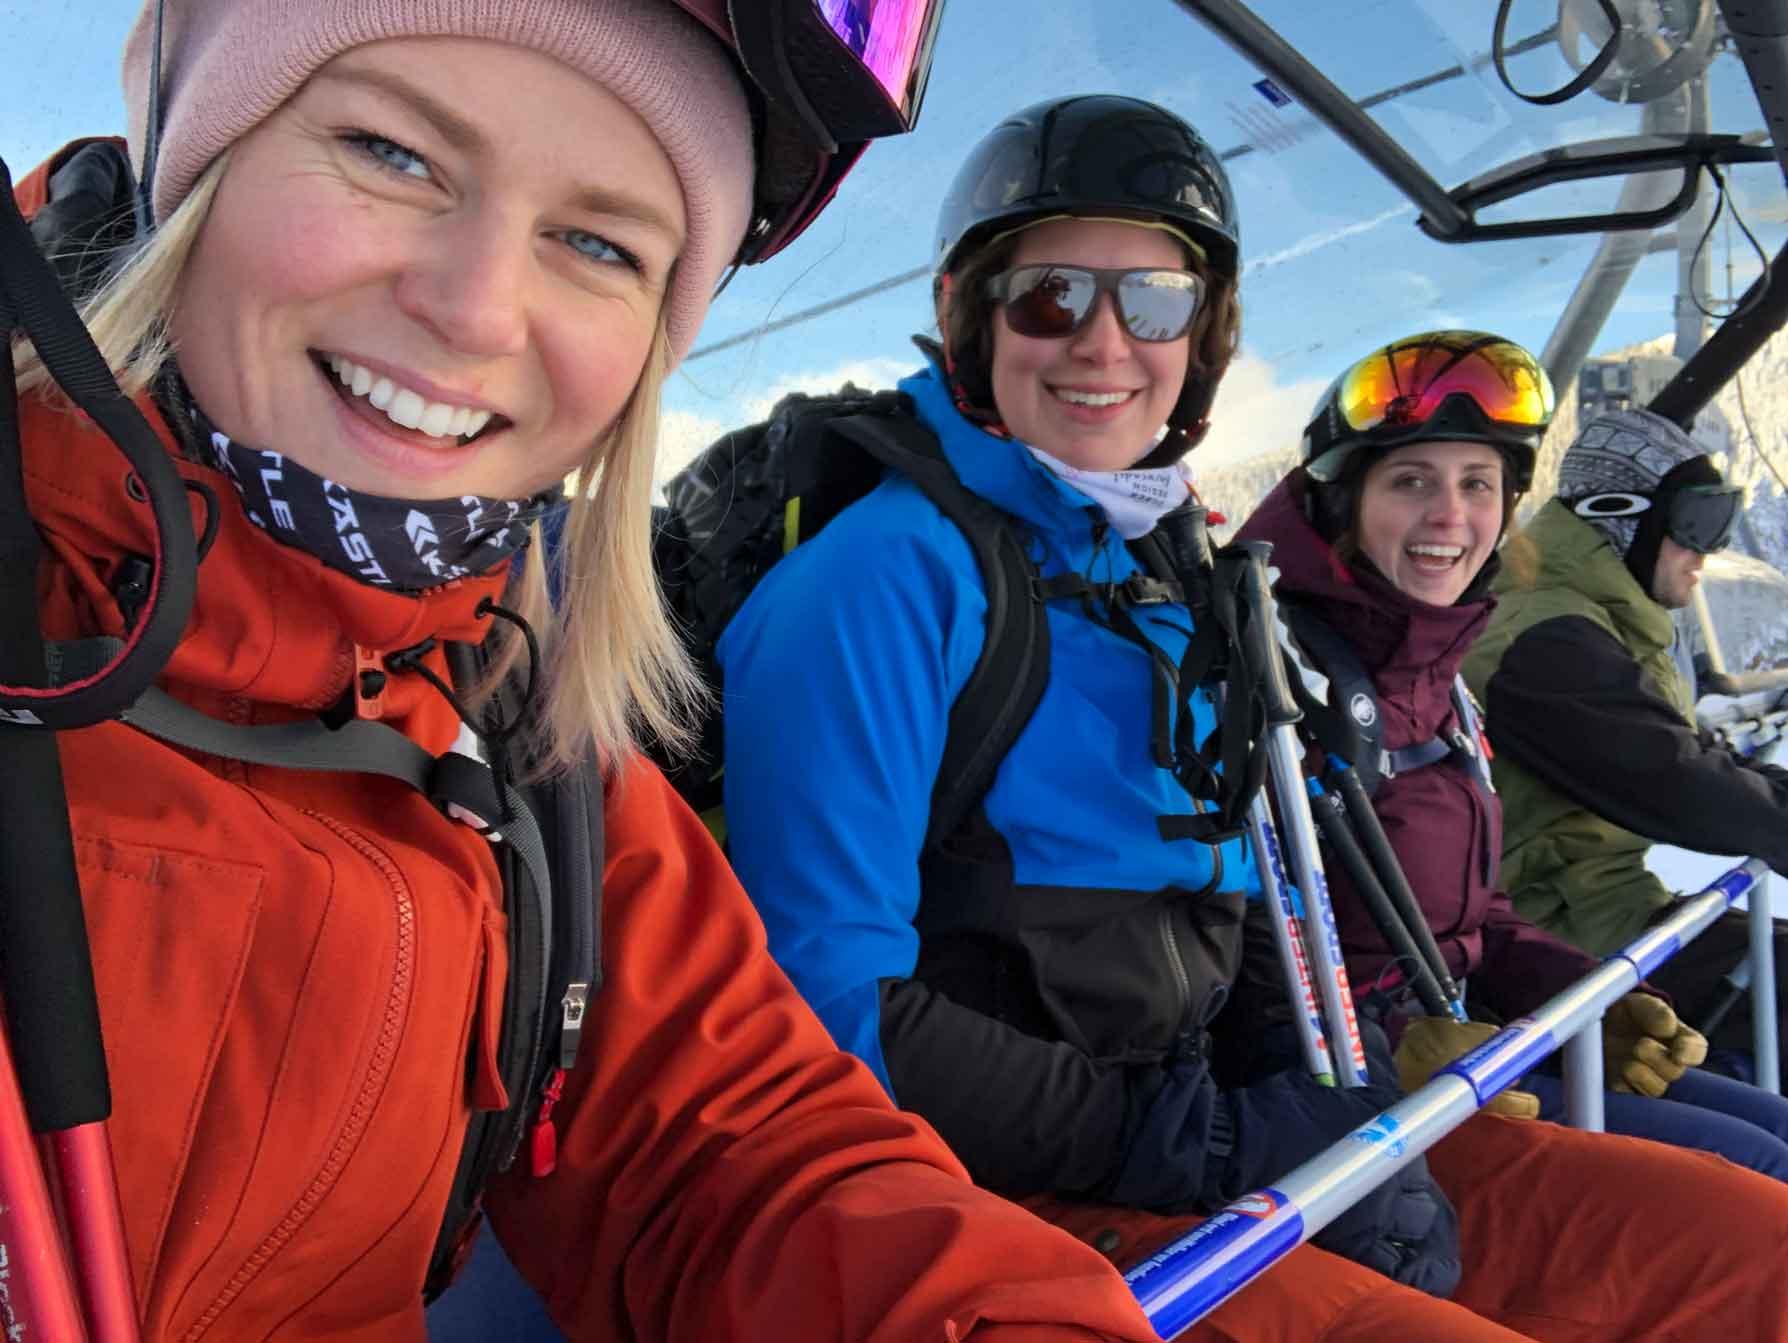 tiroler-zugspitz-arena-skifahren-munichmountaingirls